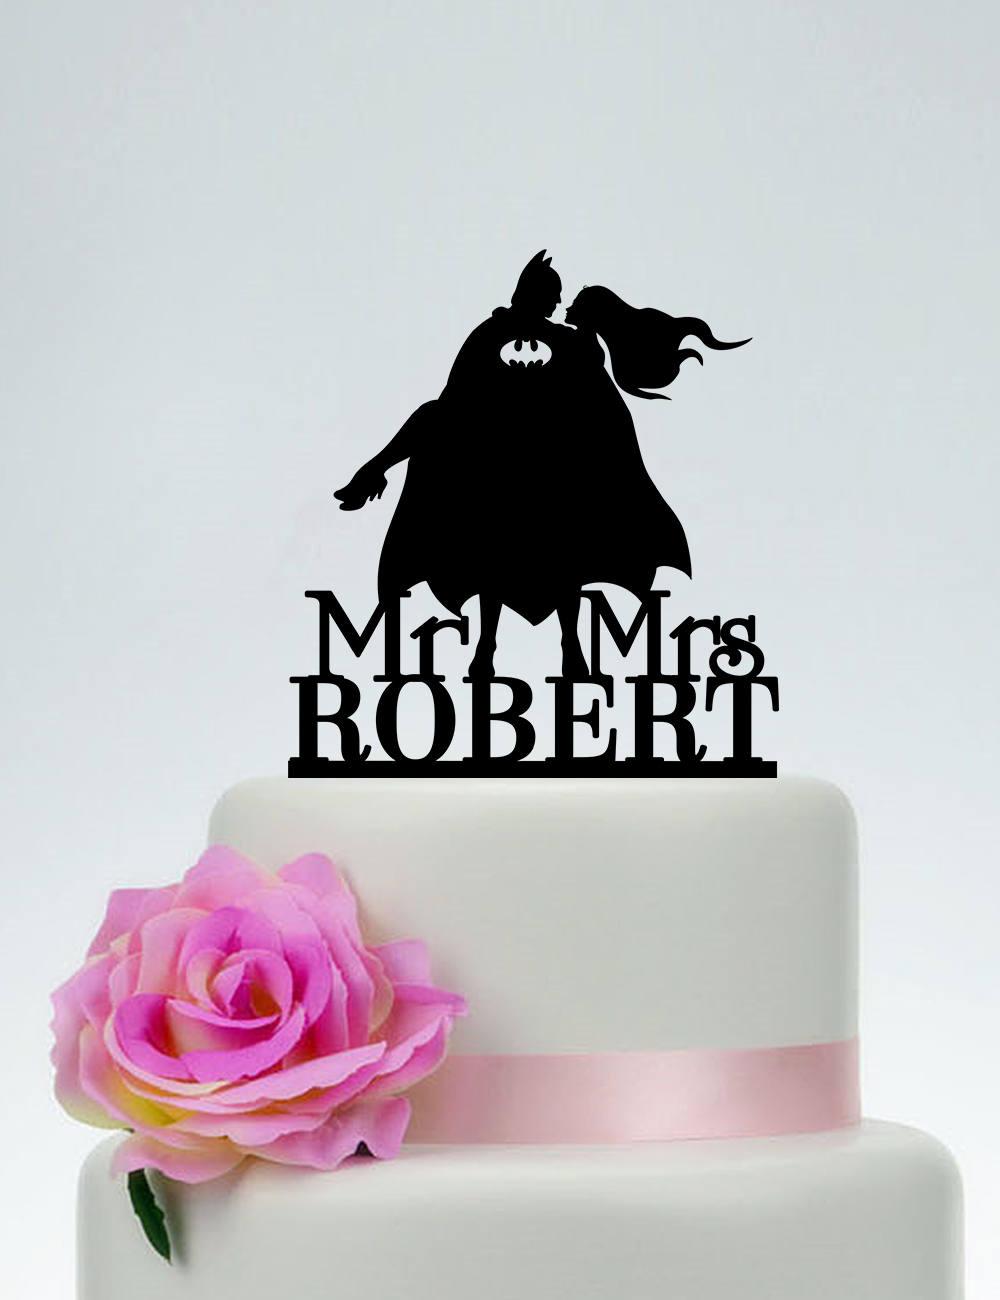 Batman Cake Topper, Wedding Topper, Mr & Mrs Topper, Super Hero Wedding, Batman Bride Silhouette, Custom Topper C245